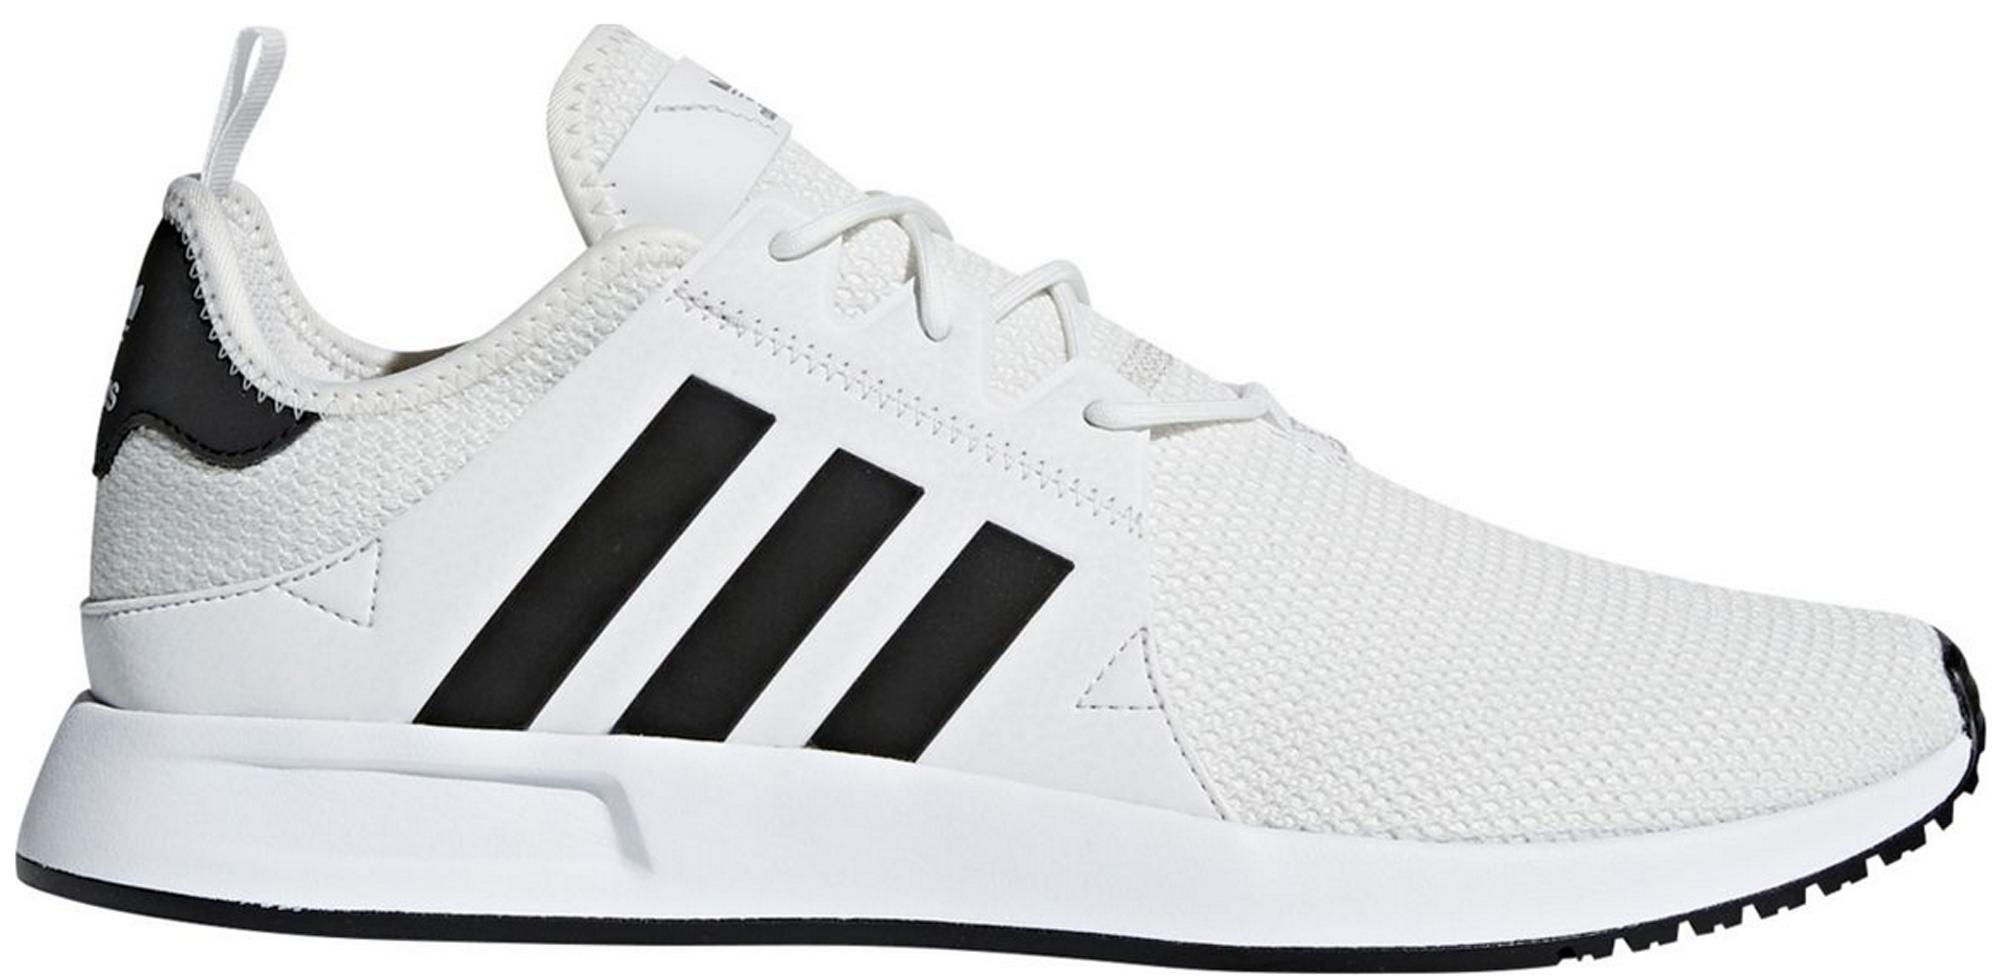 adidas X PLR White Black - CQ2406